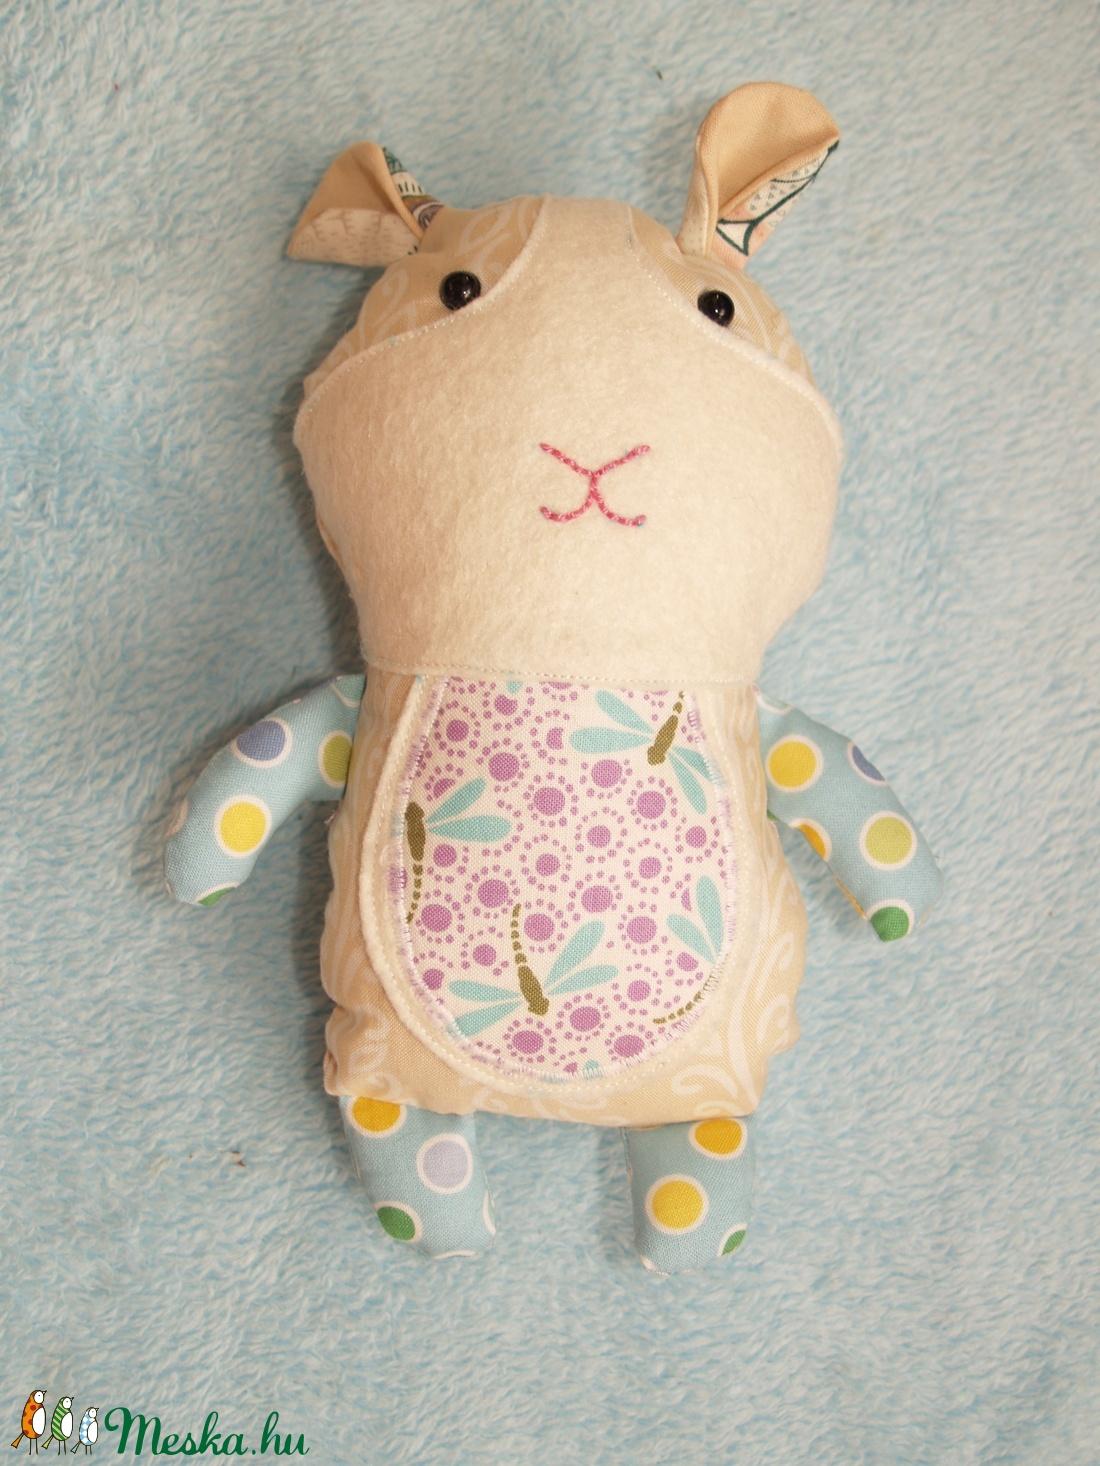 Textil tengerimalac figura (agotamama) - Meska.hu